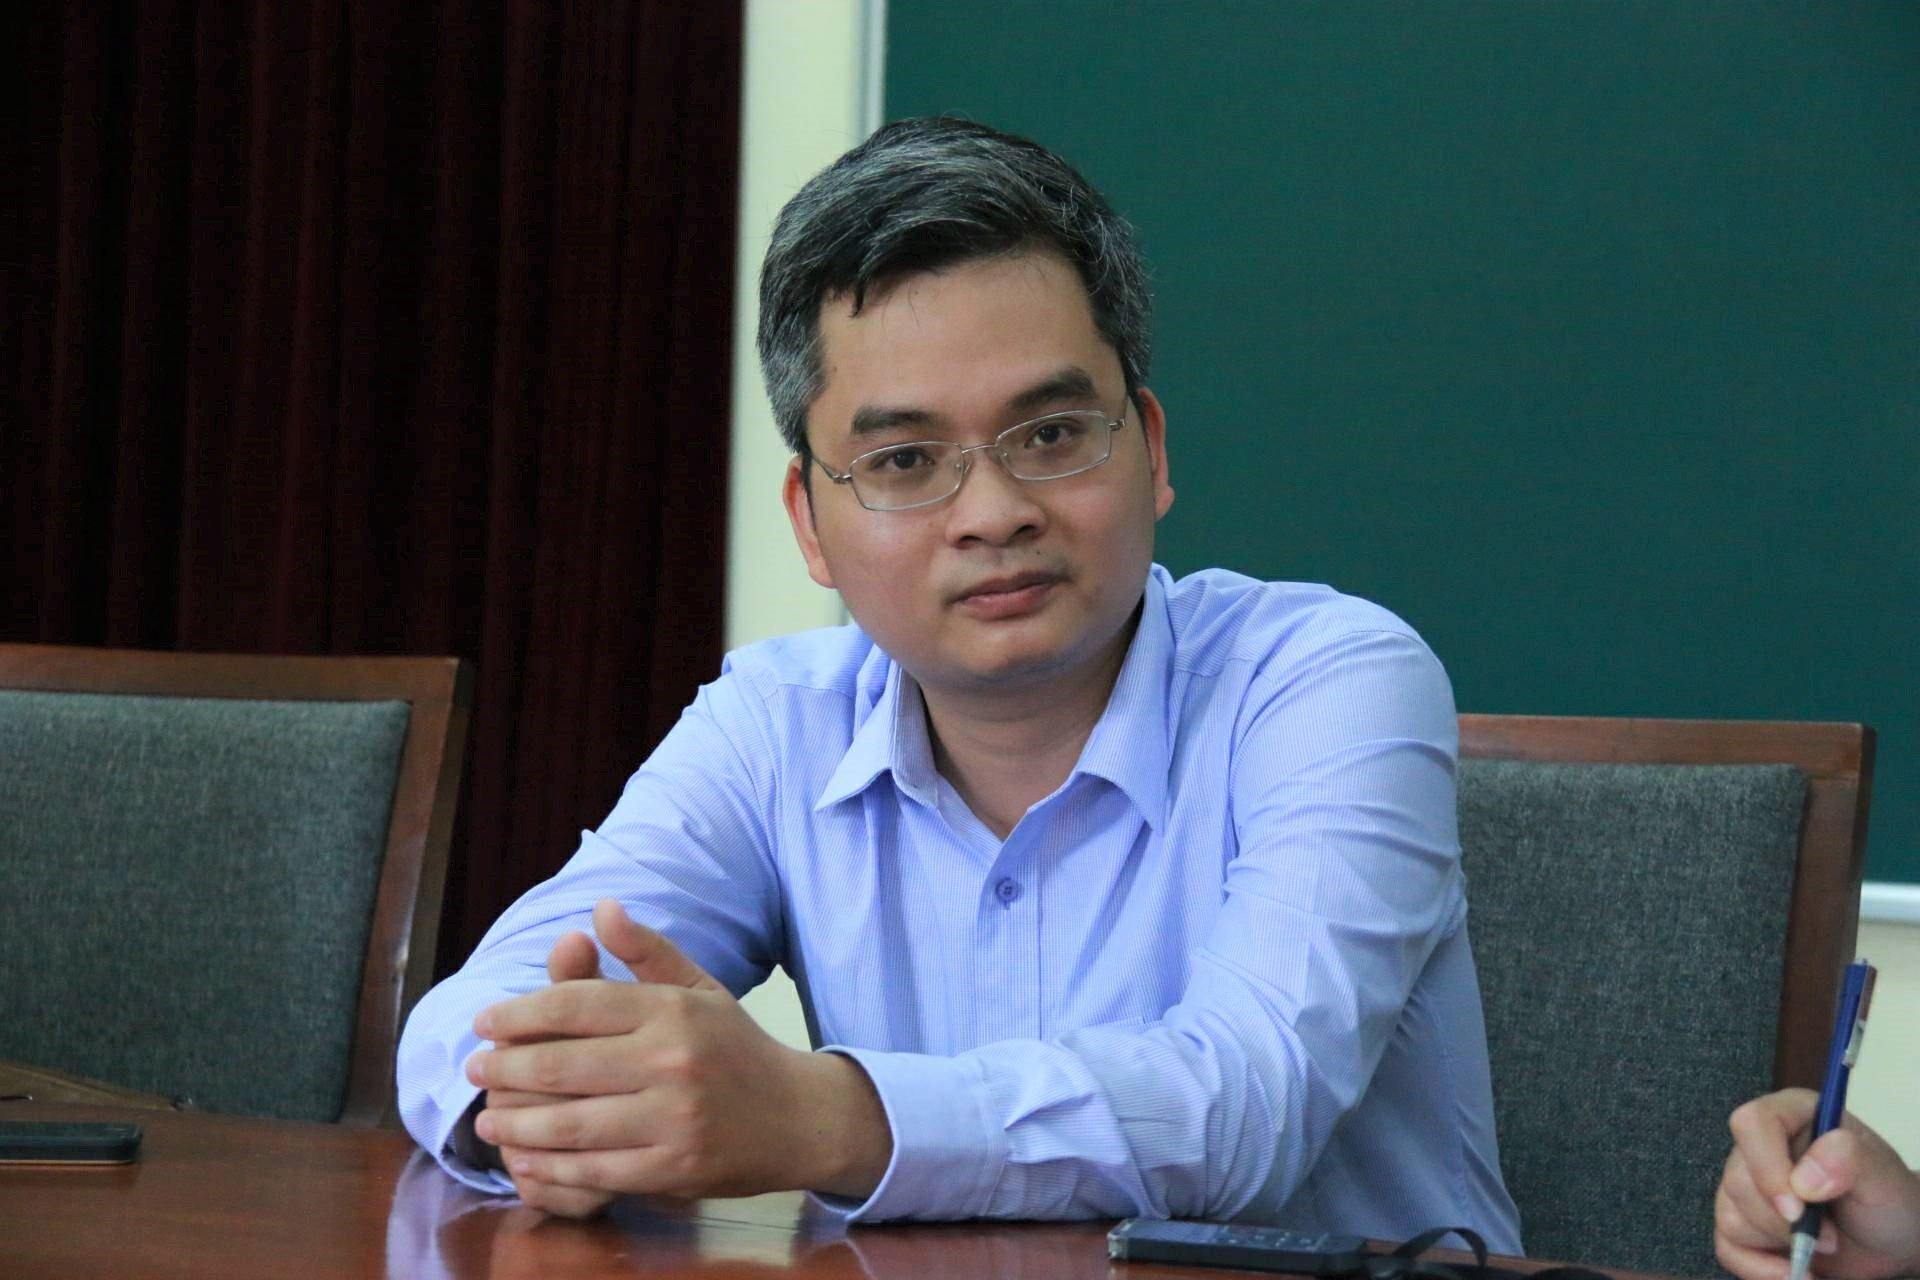 Gặp giáo sư 36 tuổi trẻ nhất Việt Nam-1